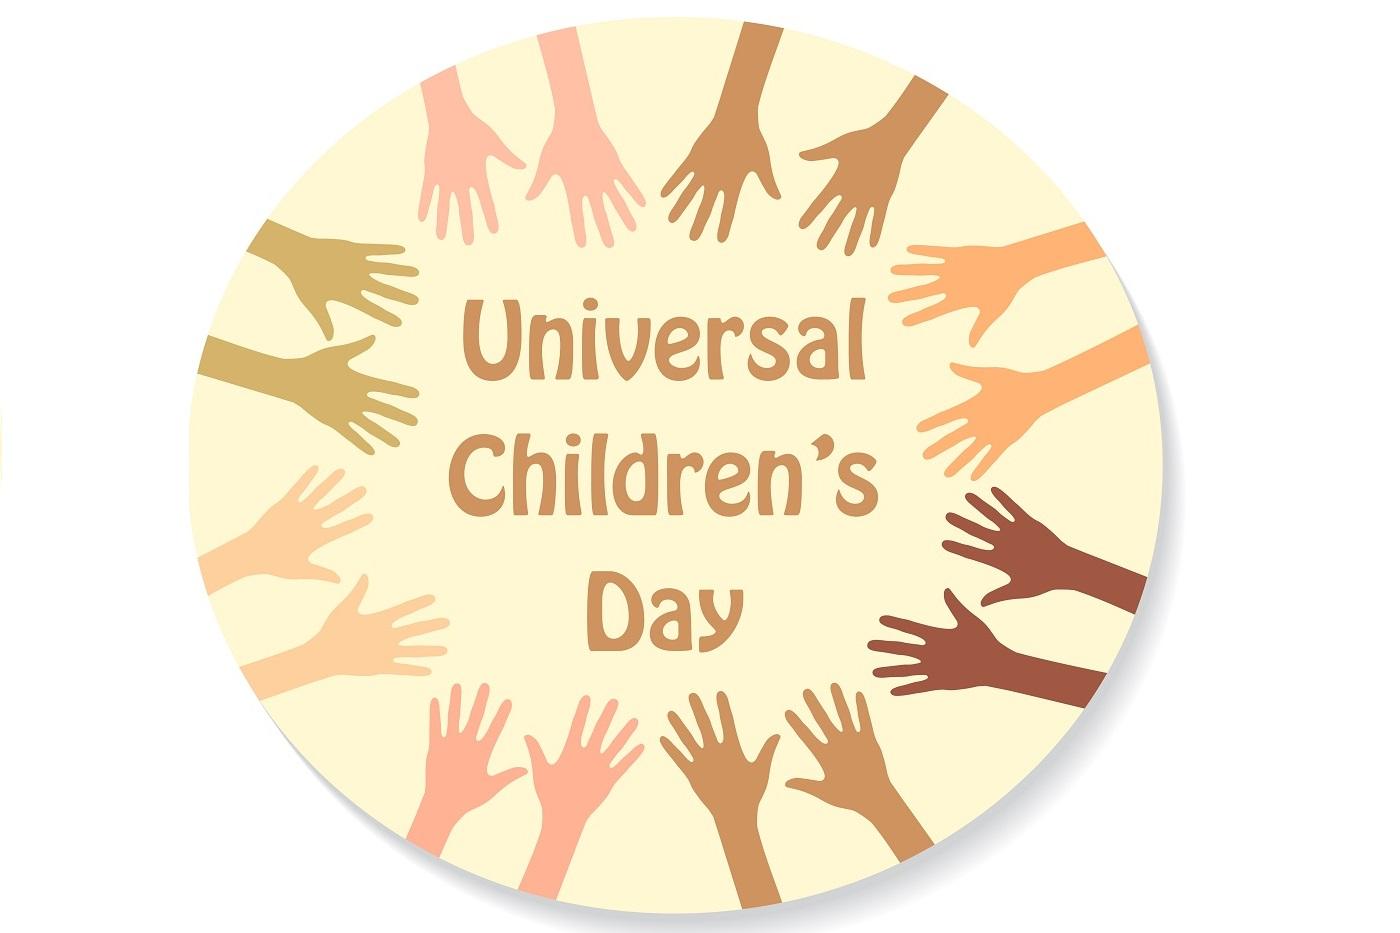 ecua universal childrens day - HD1400×933